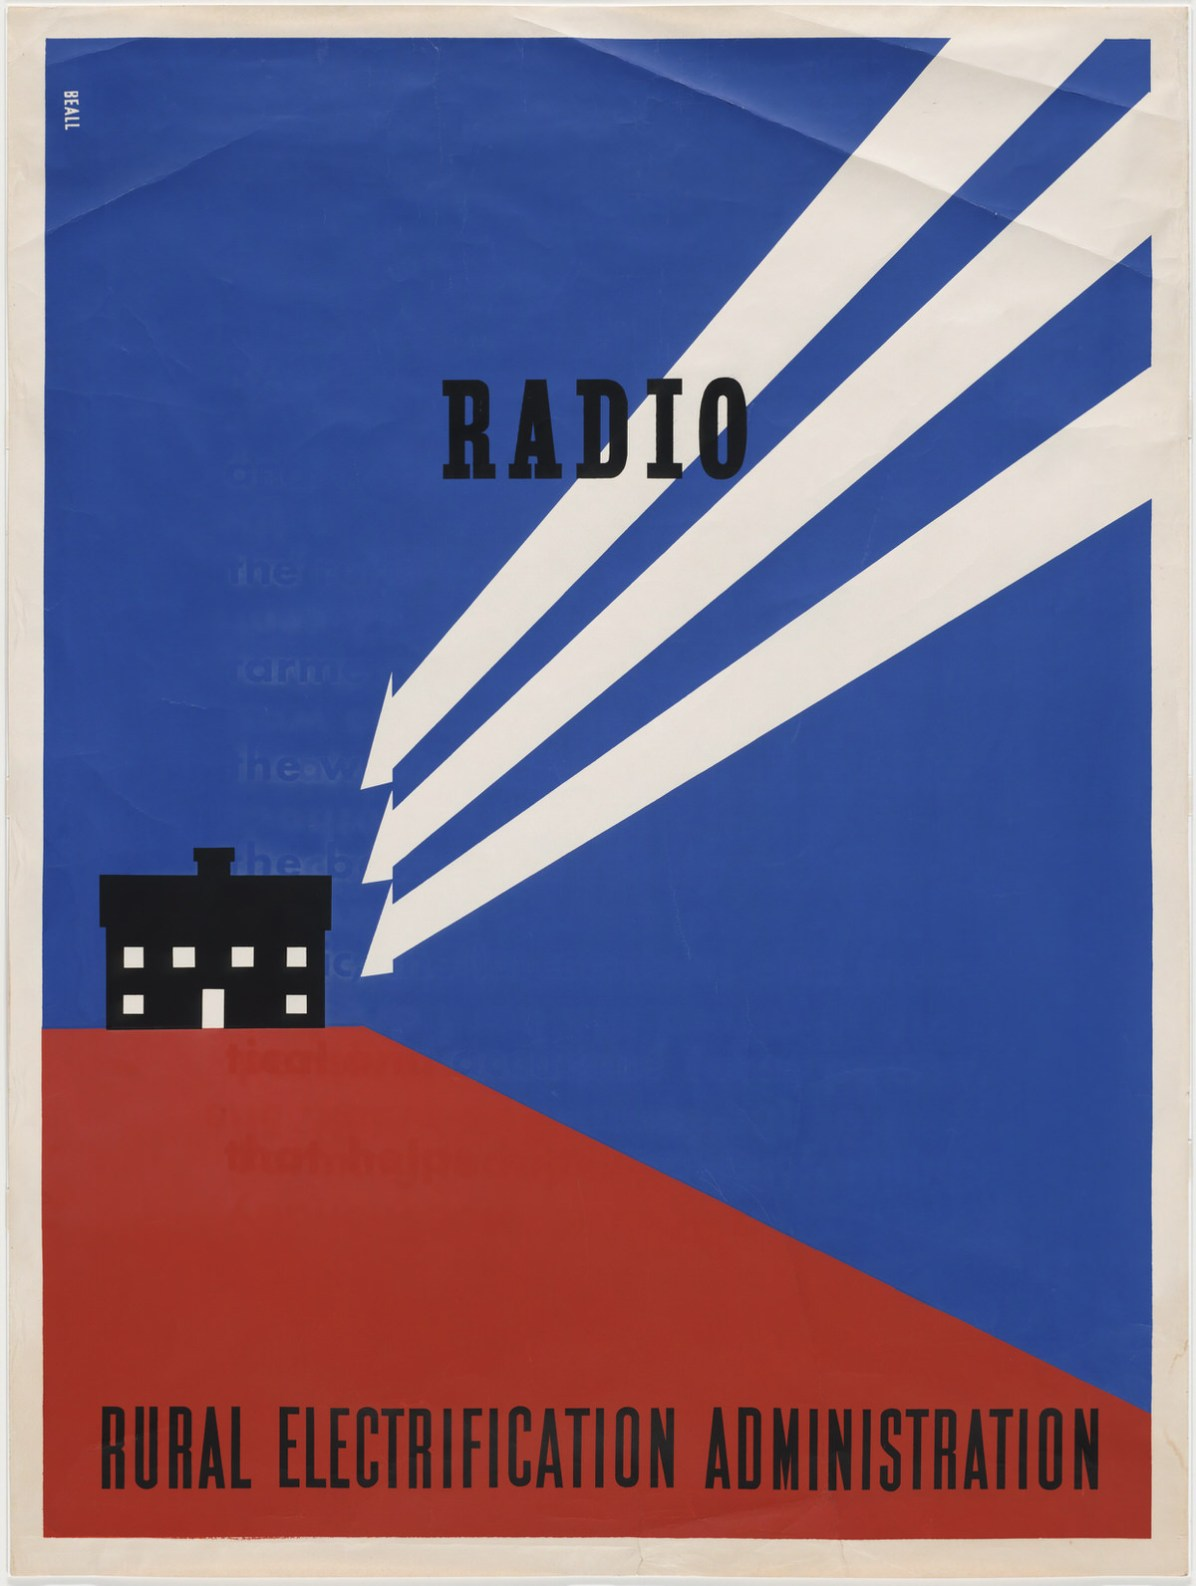 Beall, Radio – Rural Electrification Administration, 1937